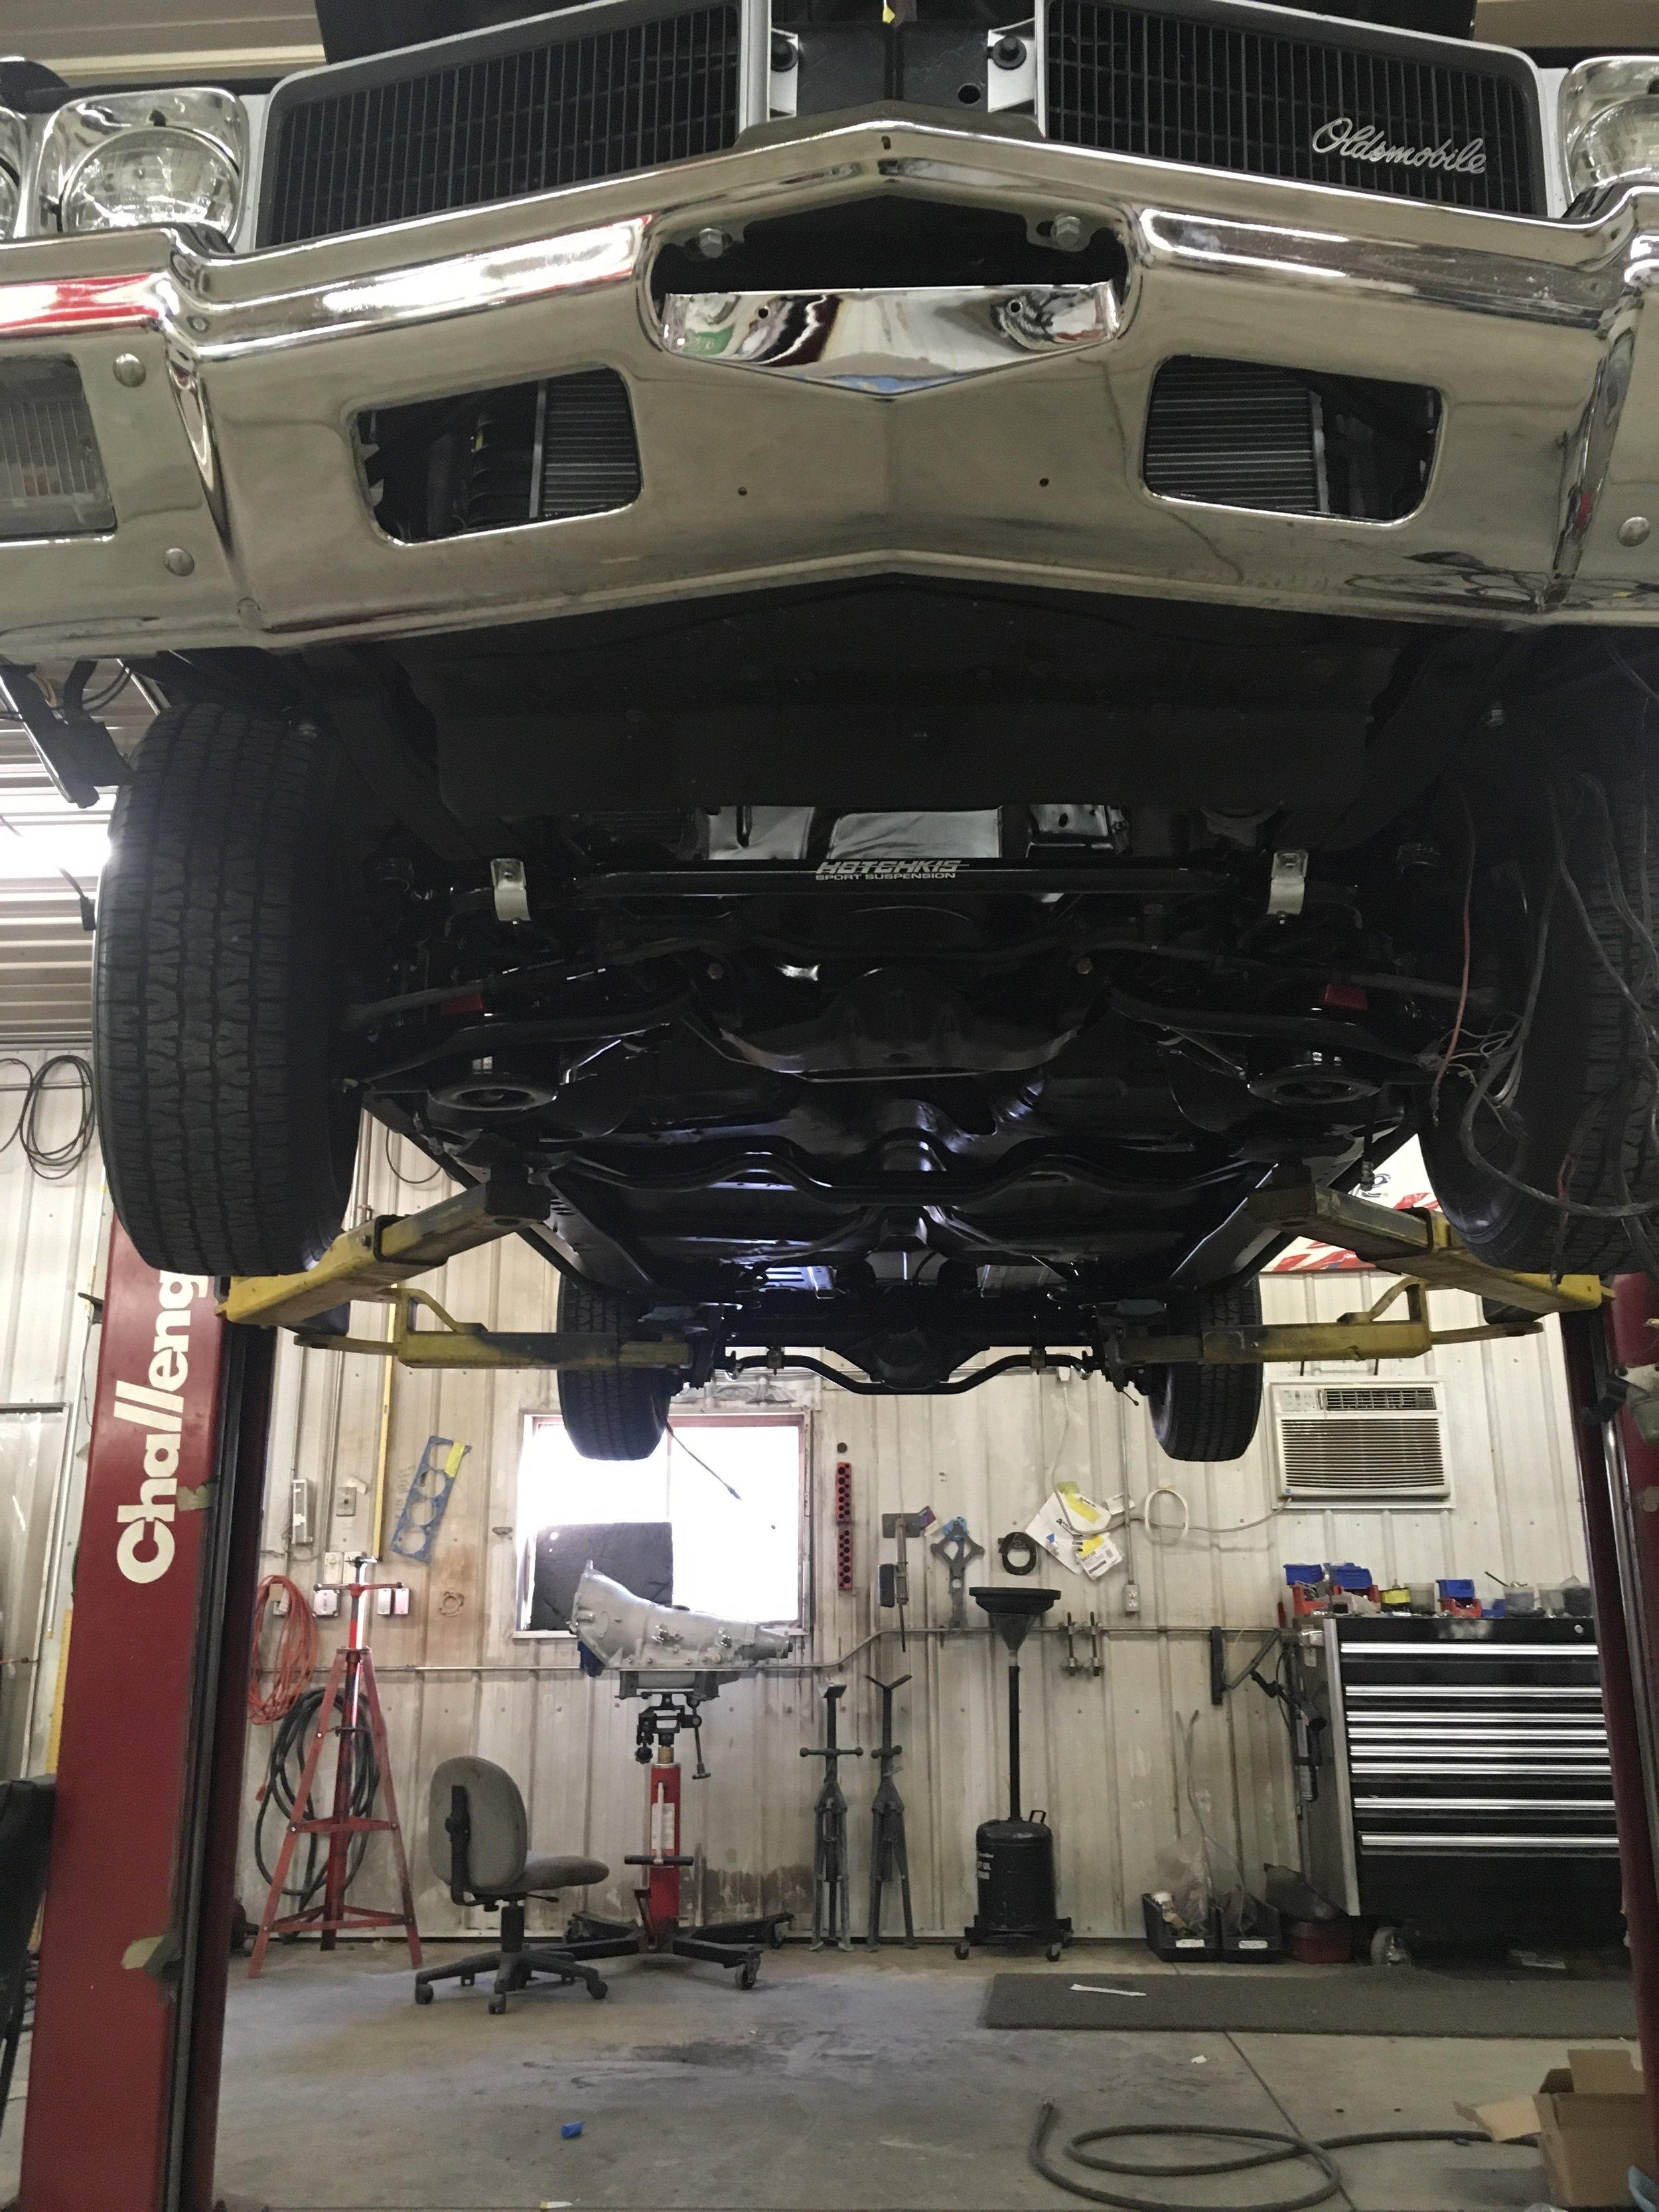 70-oldsmobile-cutlas-minneapolis-custom-hot-rod-car-restoration-3.jpg